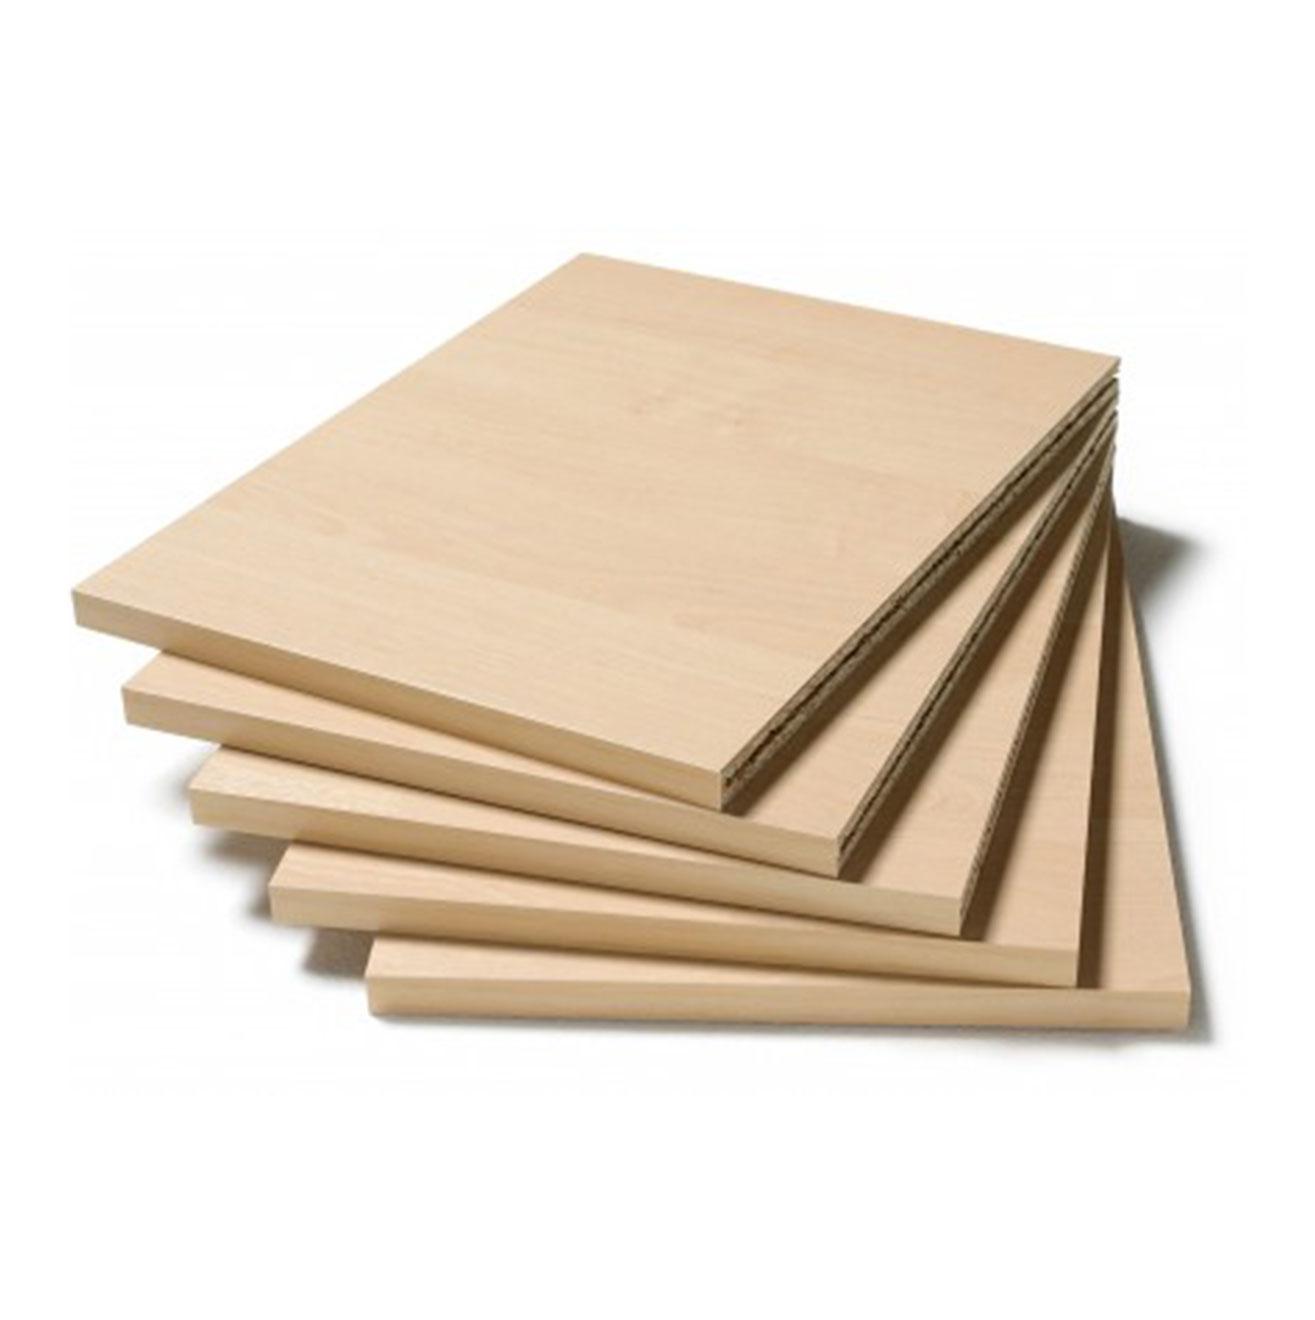 Extra shelving packs - Birch